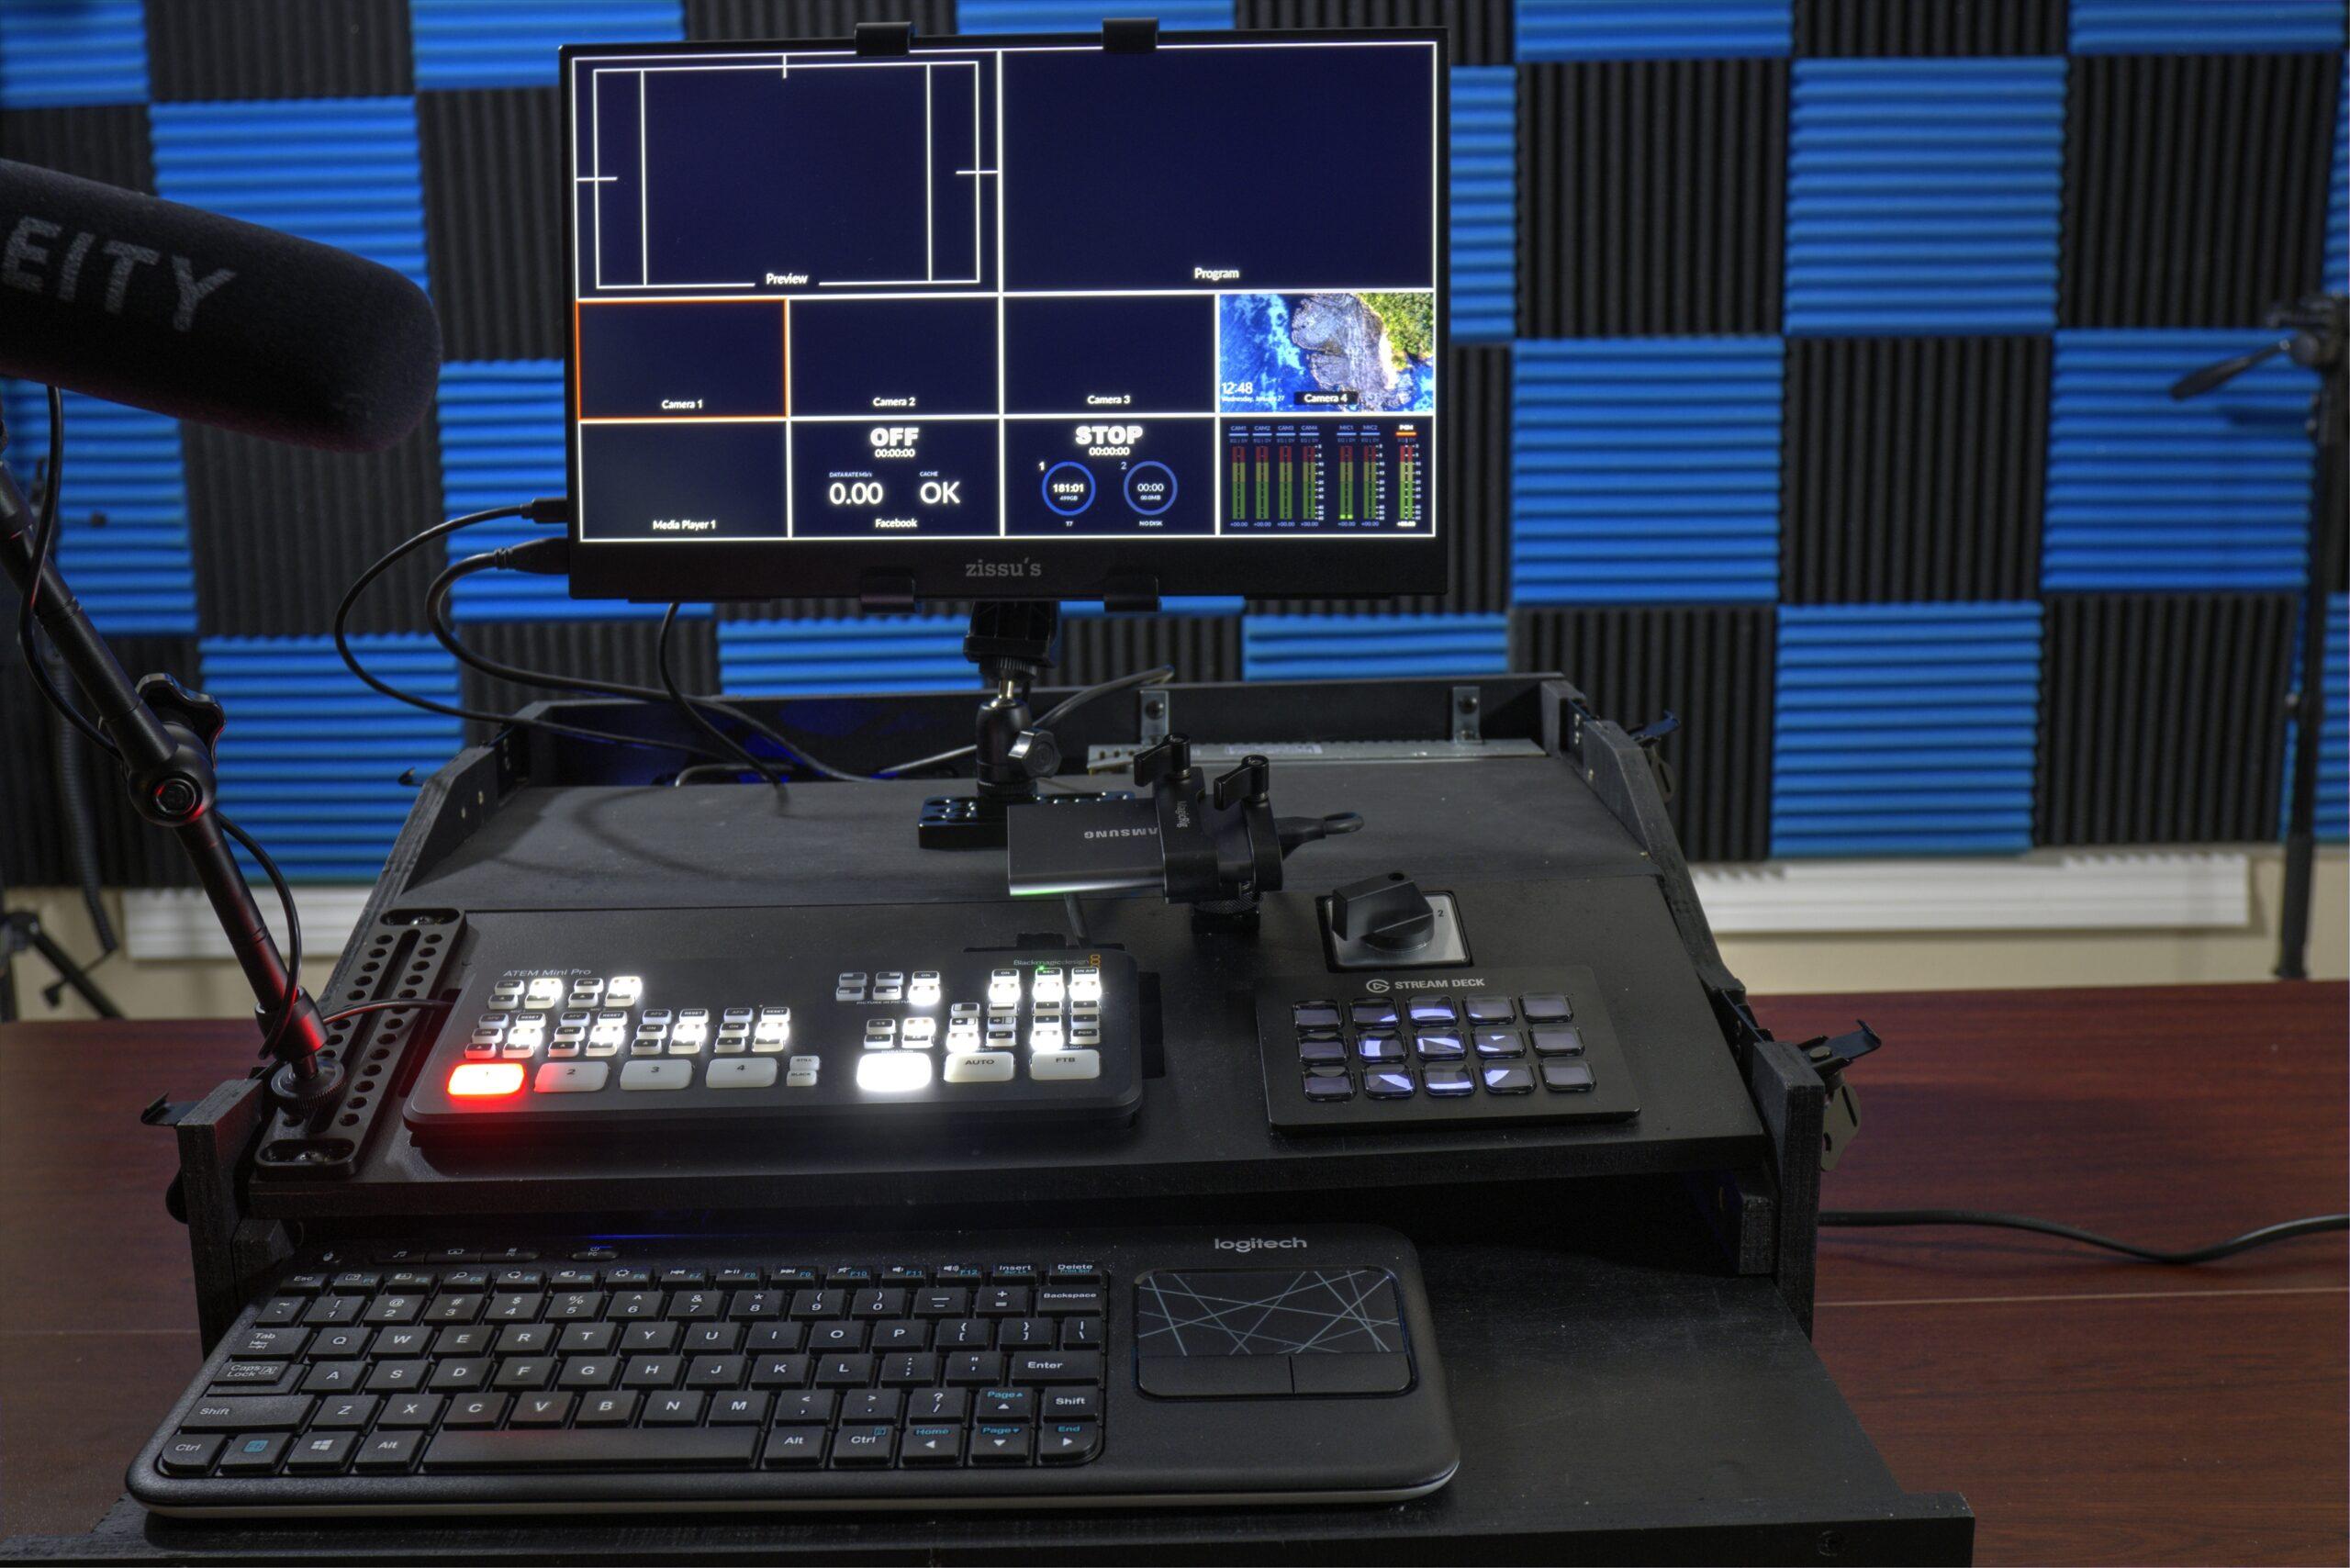 Castcrate Portable Live Streaming Mobile Broadcast Case For Blackmagic Design Atem Mini Video Switcher Custom Fly Pack Mobile Broadcast Case For Blackmagic Desing Atem Mini Atem Mini Pro Atem Mini Pro